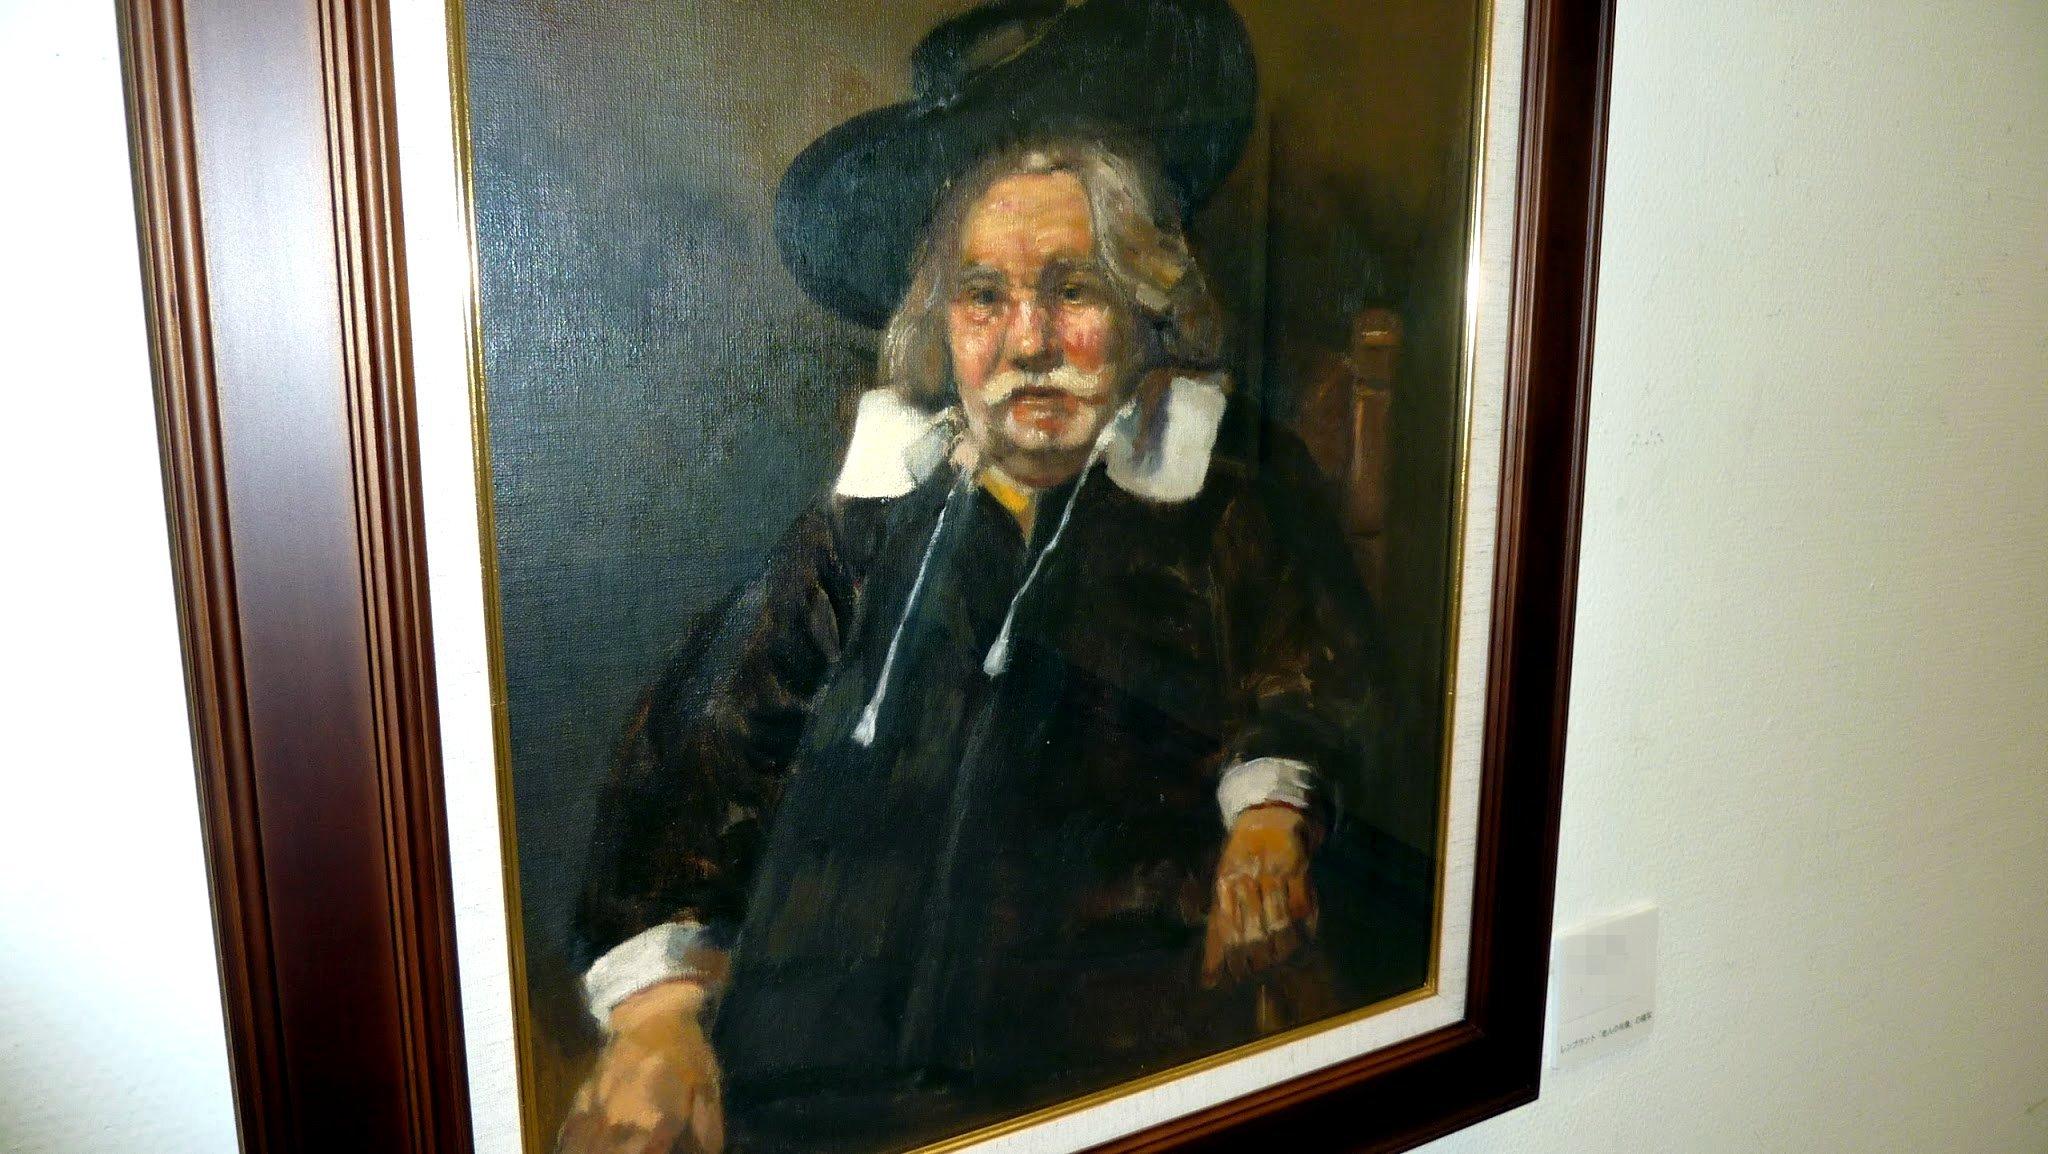 A copy of Rembrandt's 'Portrait of an Elderly Man' by Jagroar